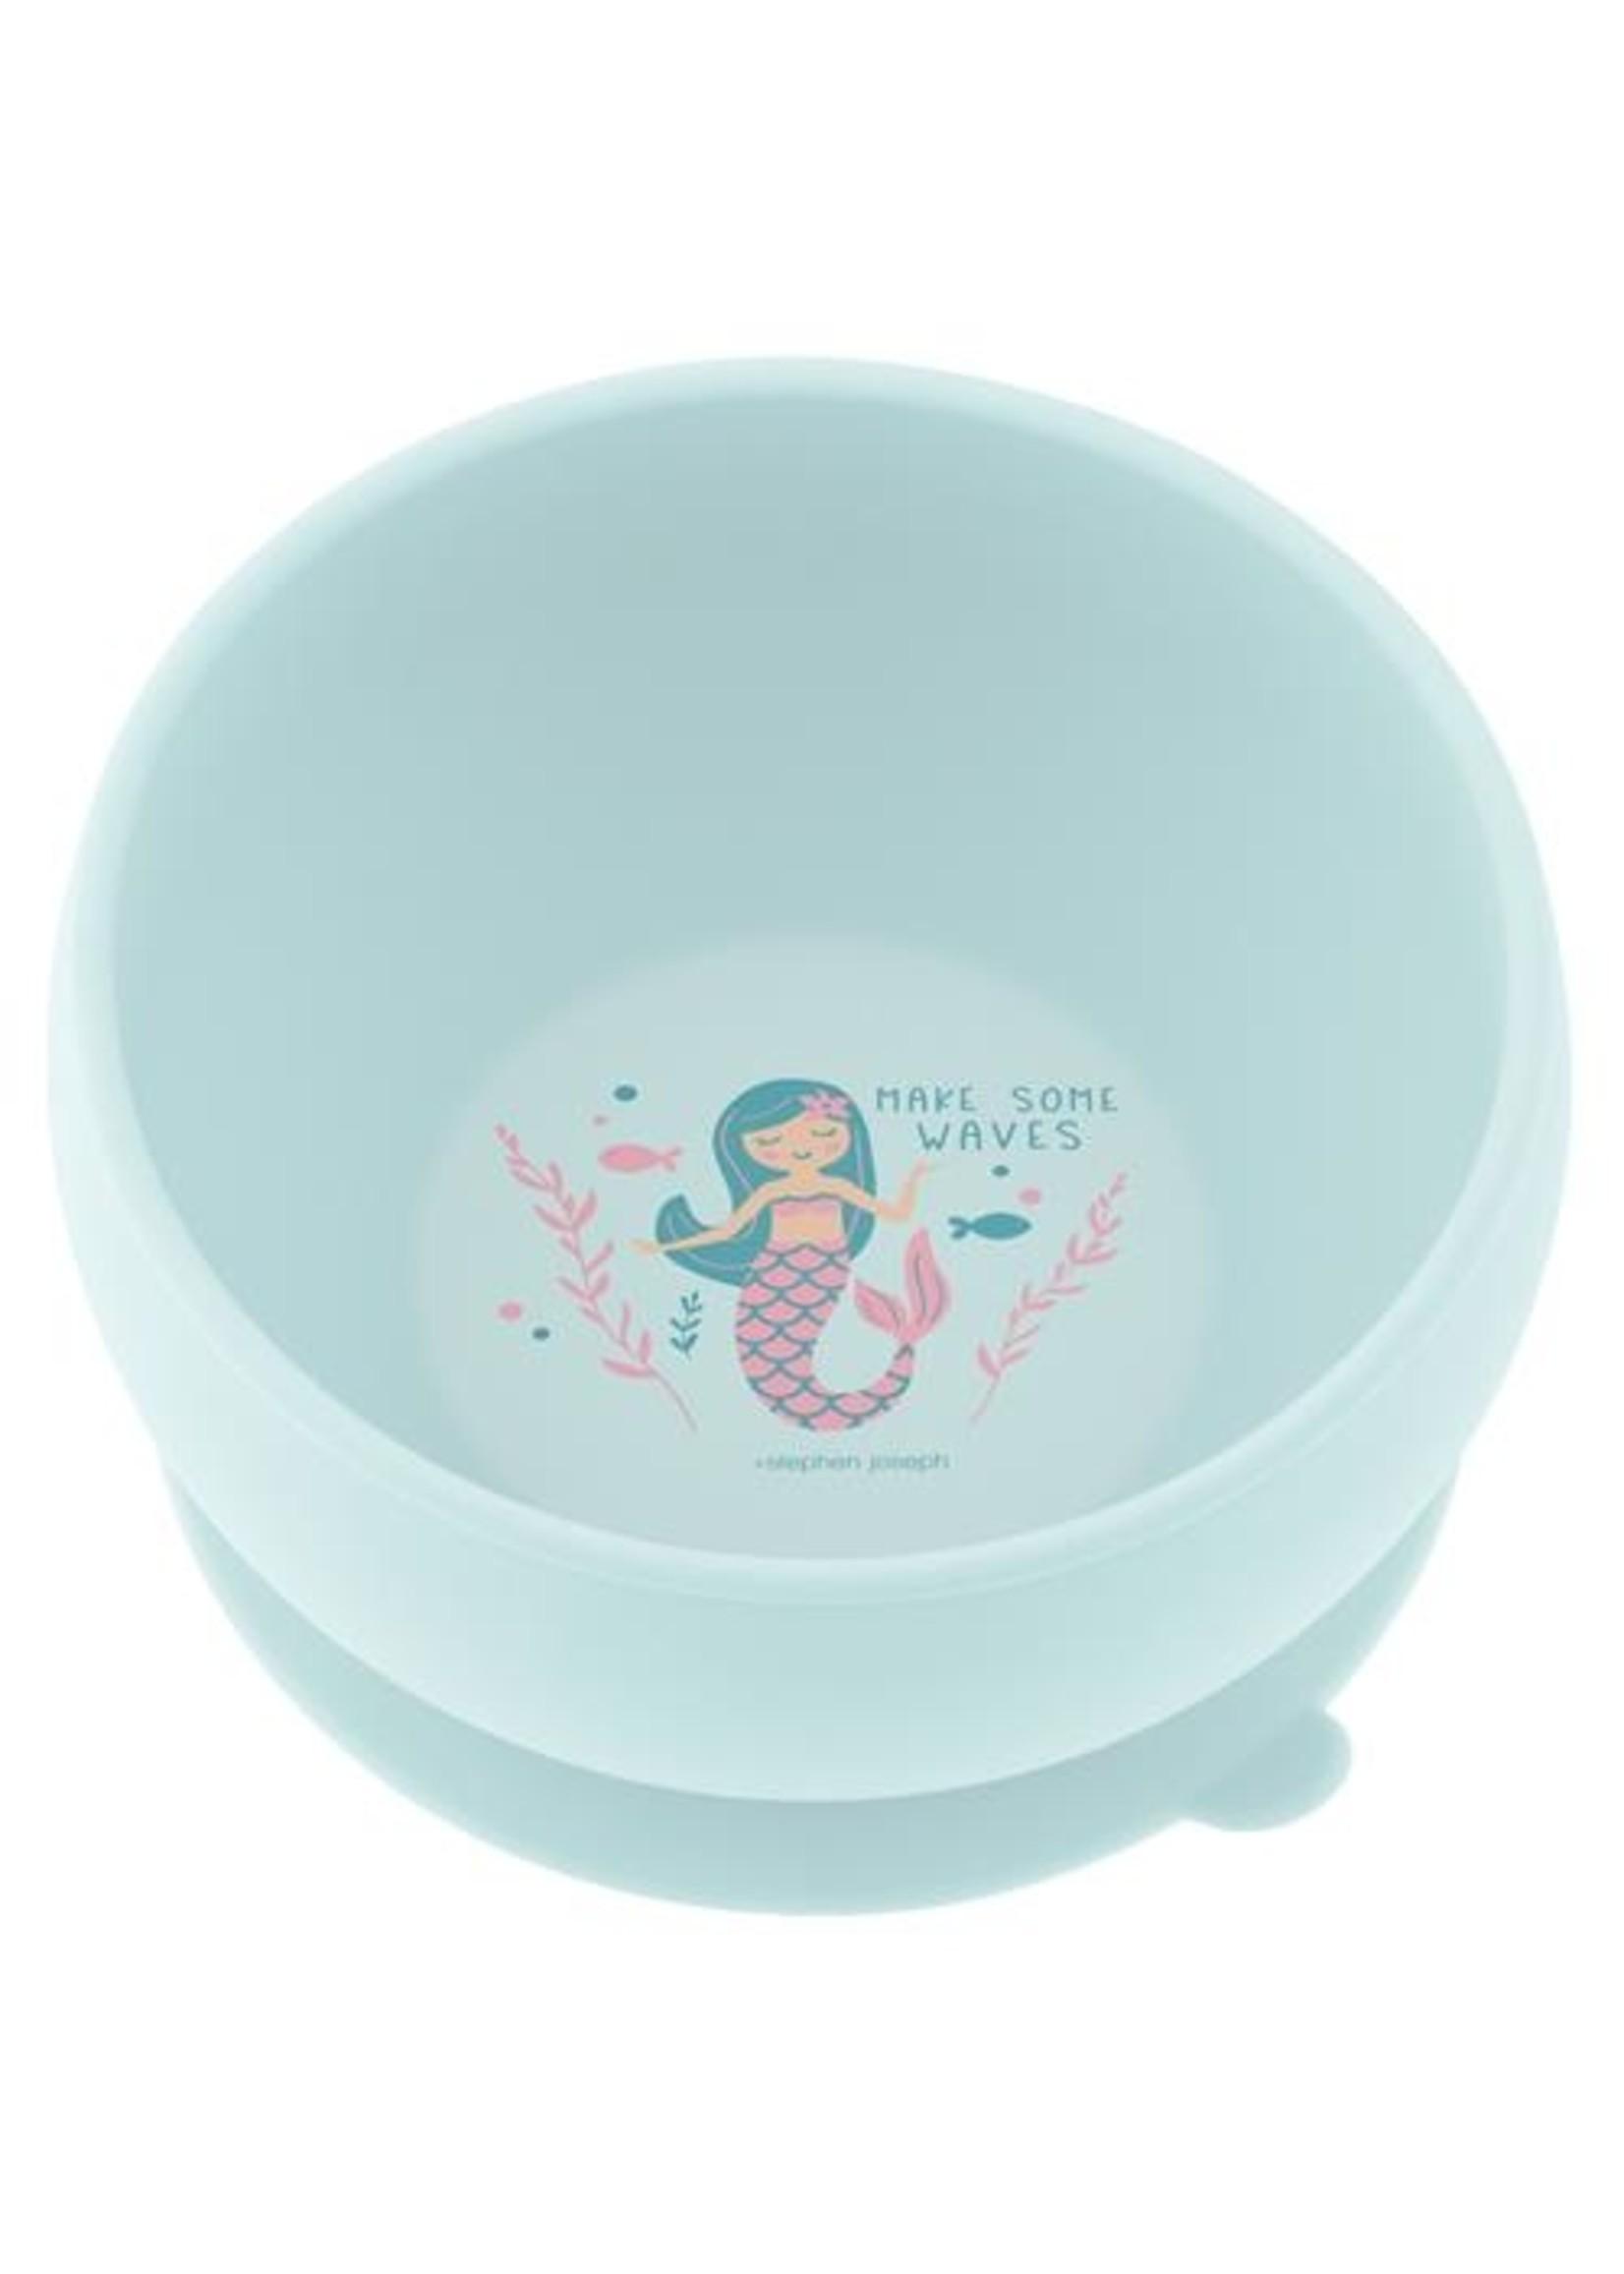 stephen joseph Silicone Bowl - Mermaid